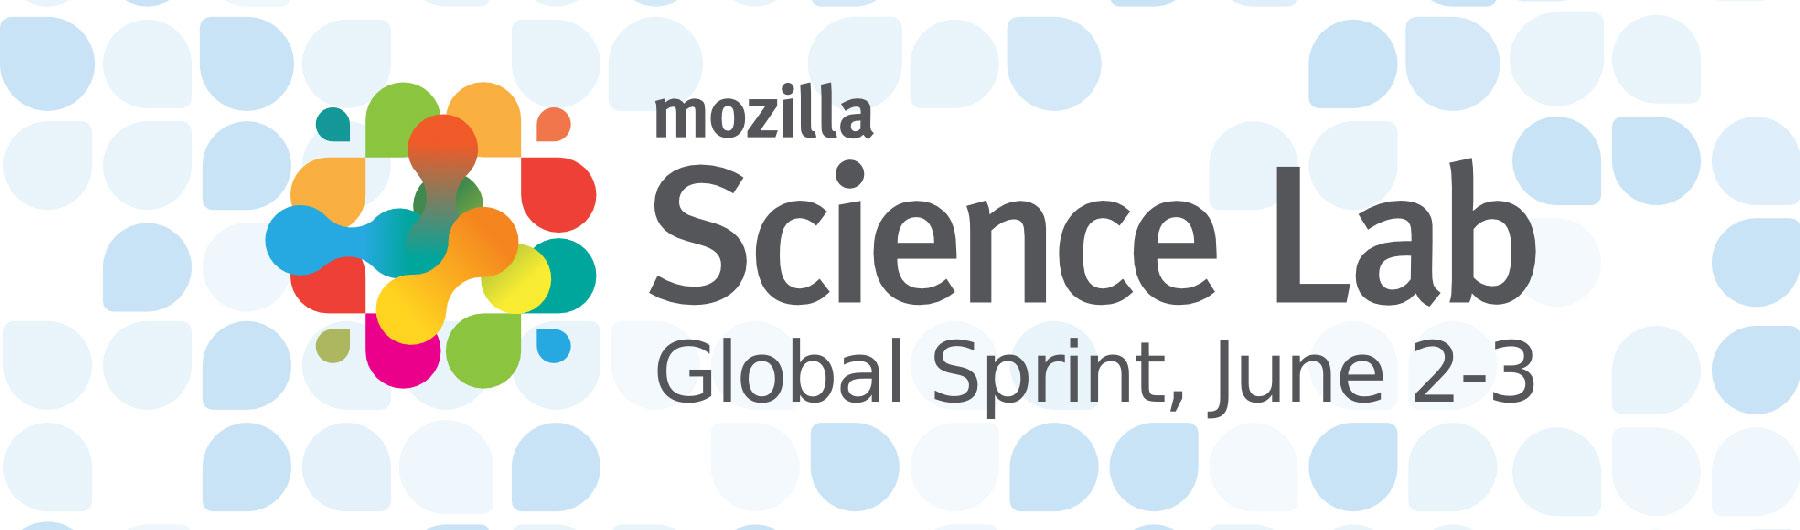 Mozilla Science Global Sprint 2016, Potchefstroom